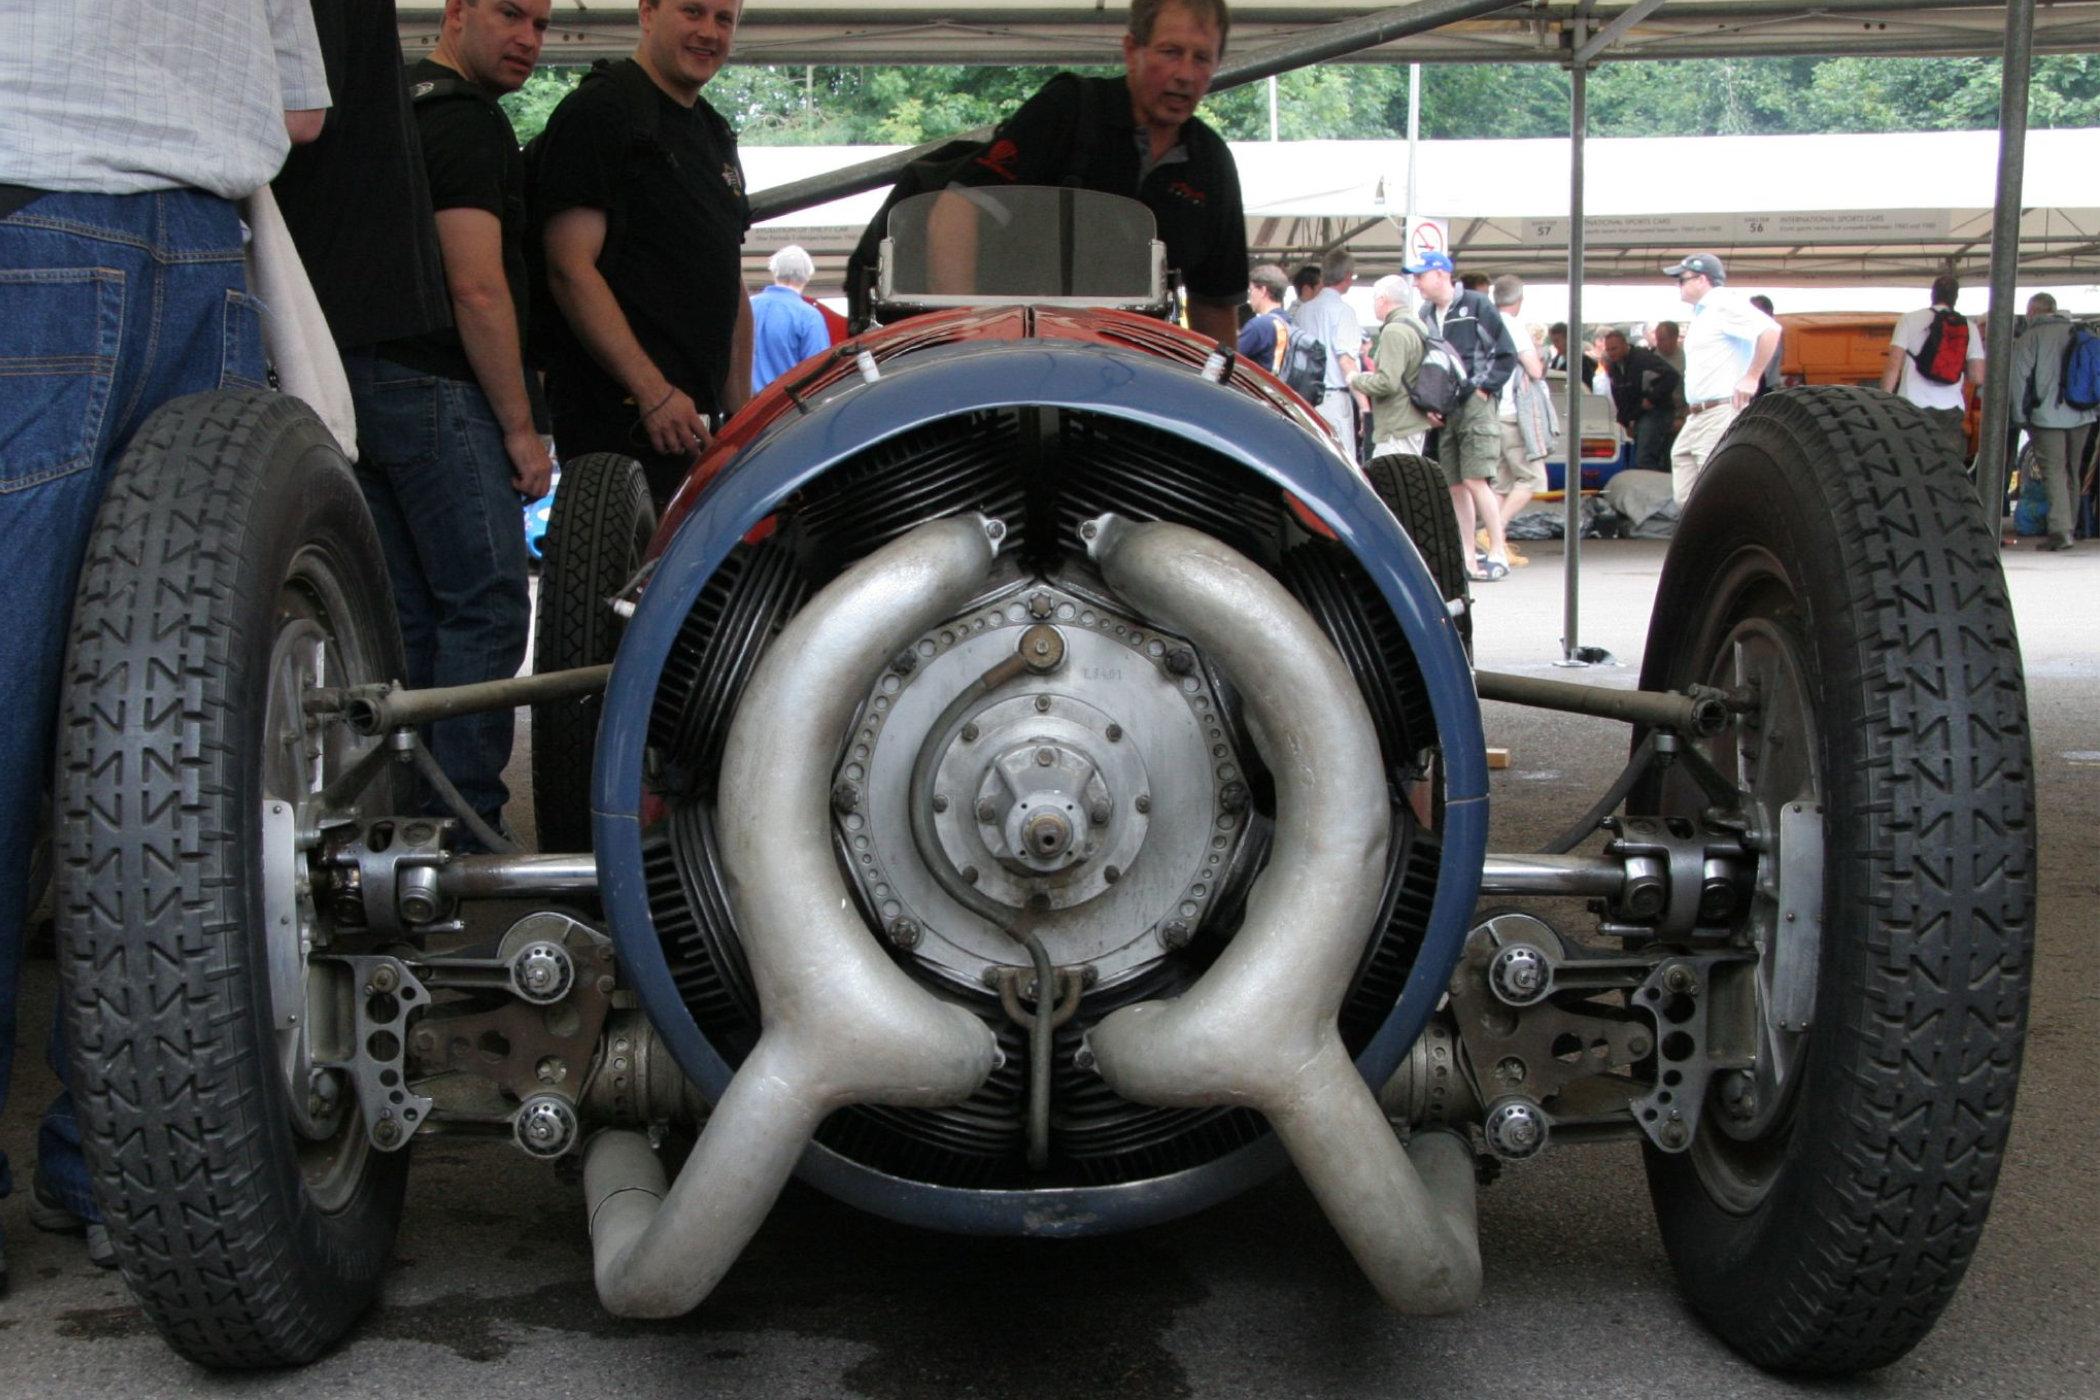 1935 Monaco-Trossi Grand Prix car with Radial Engine 2